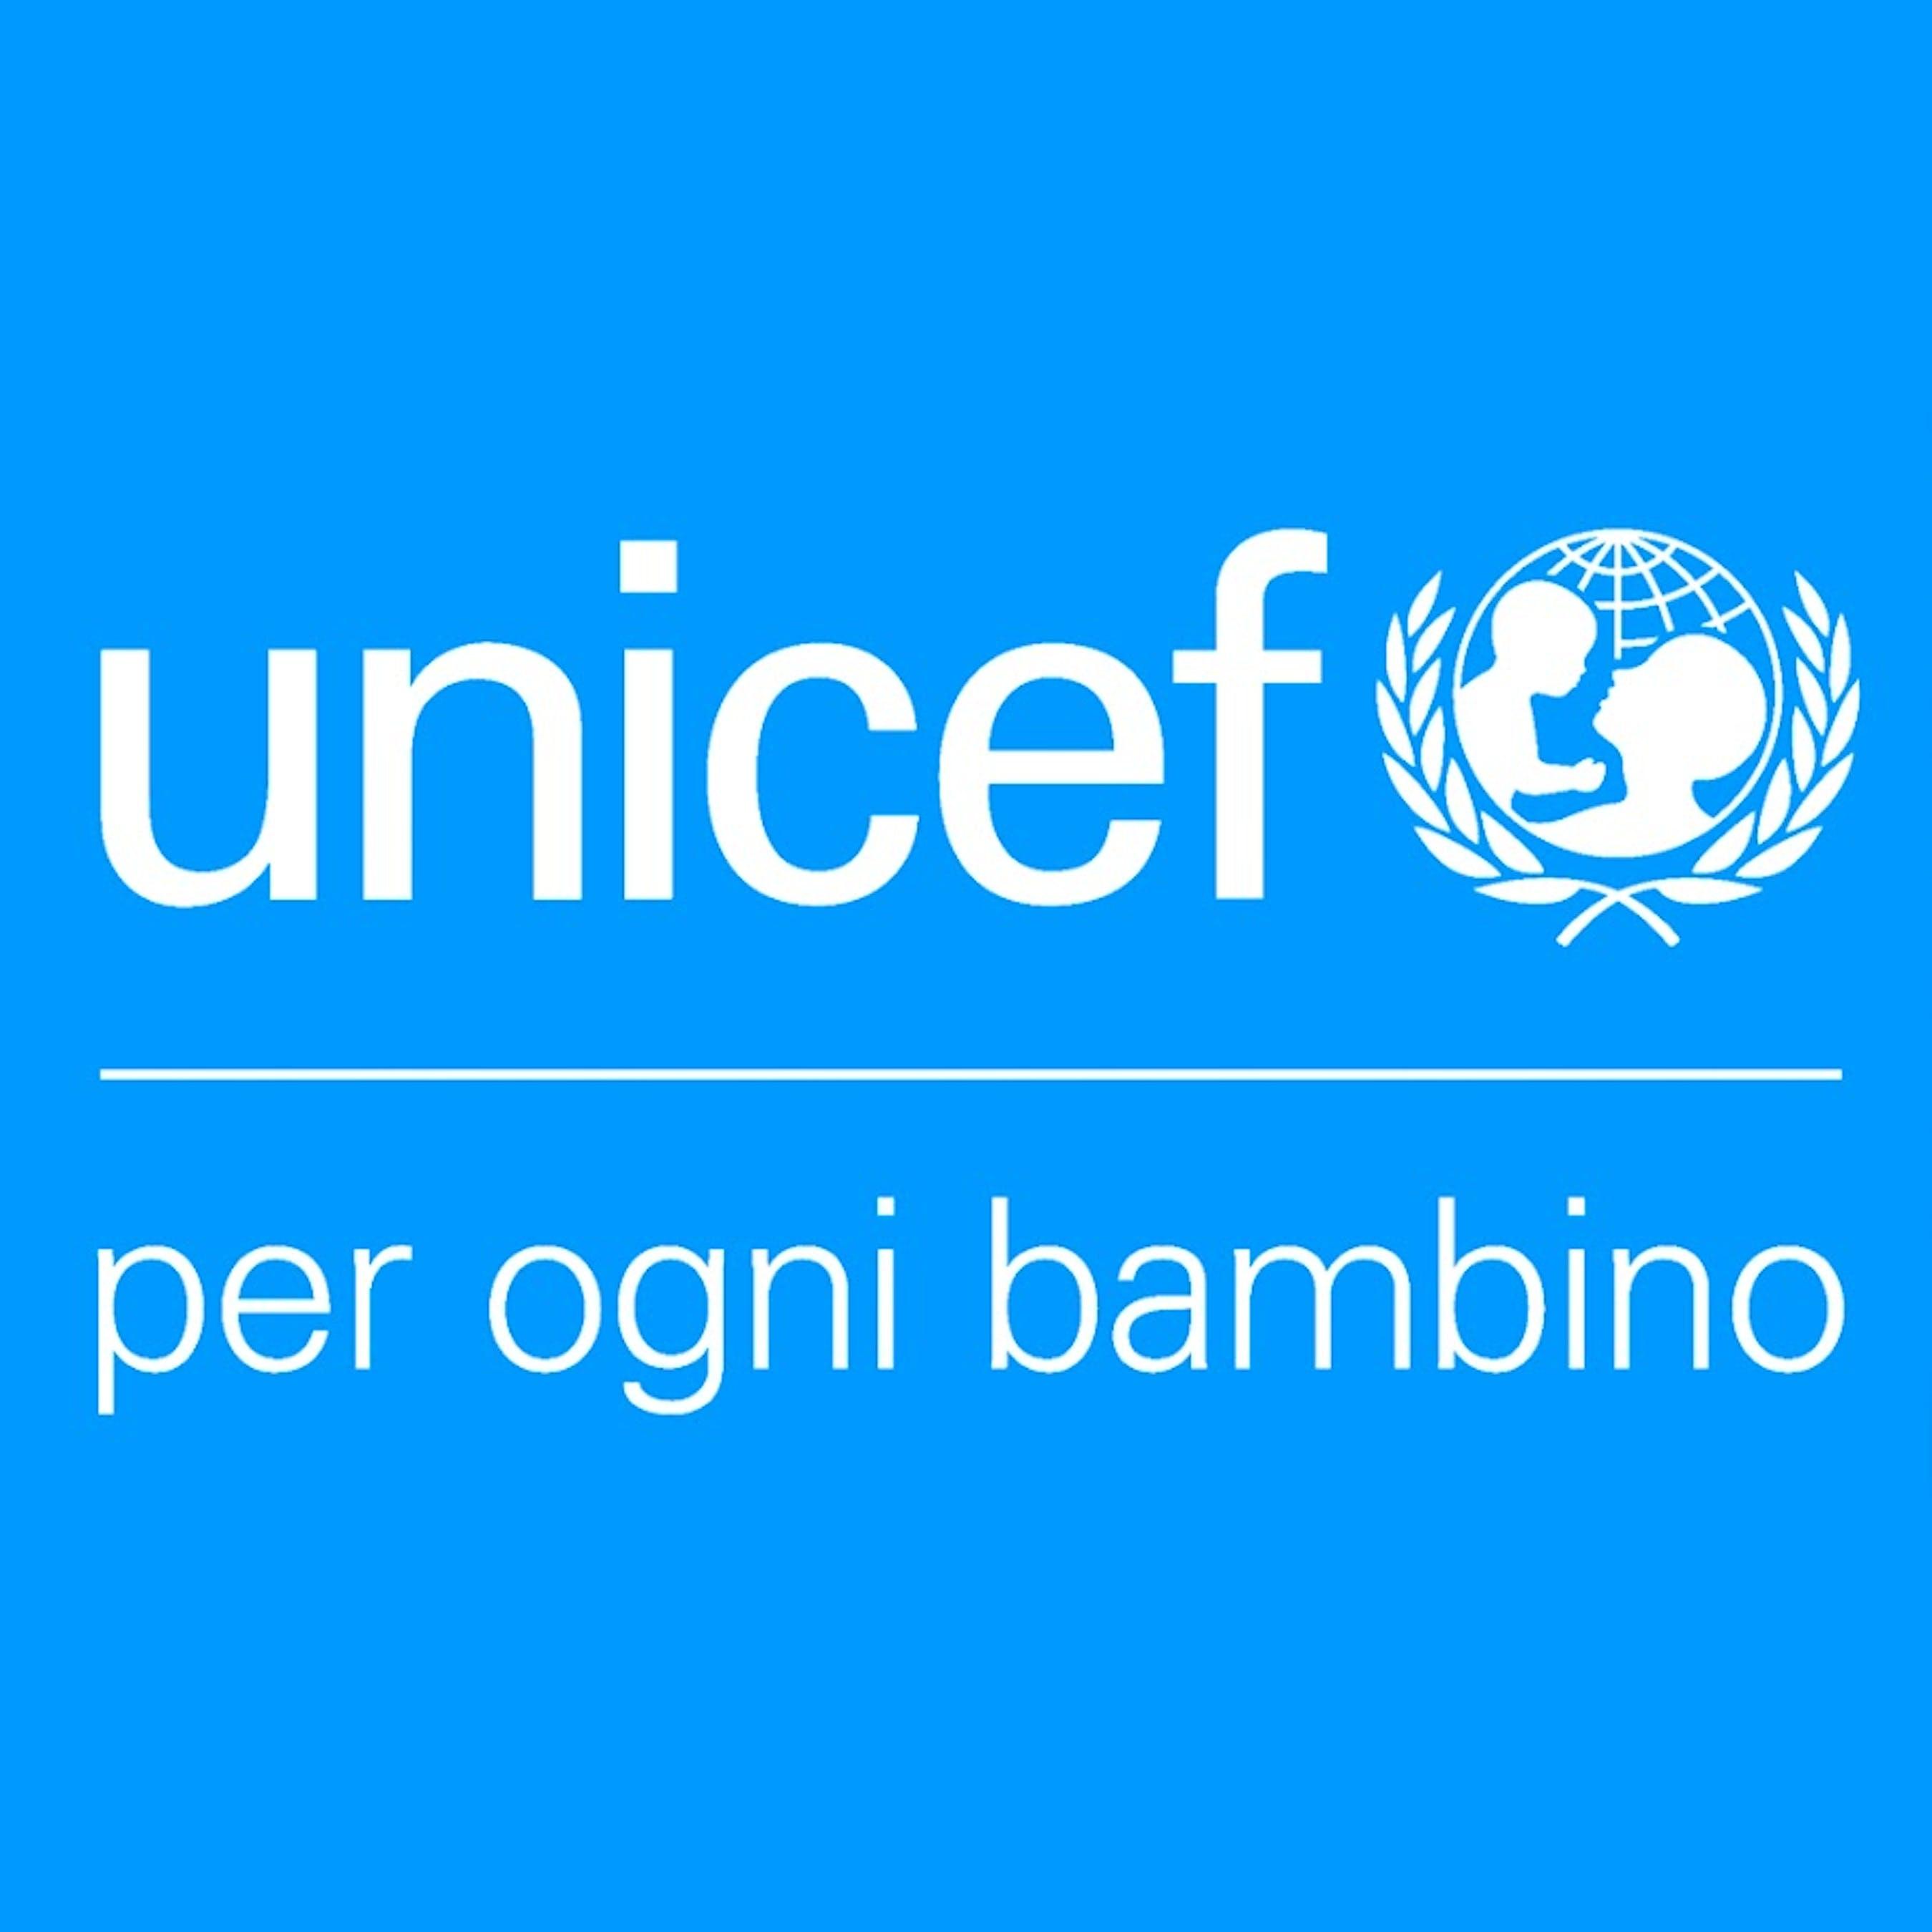 Samengo (UNICEF Italia)